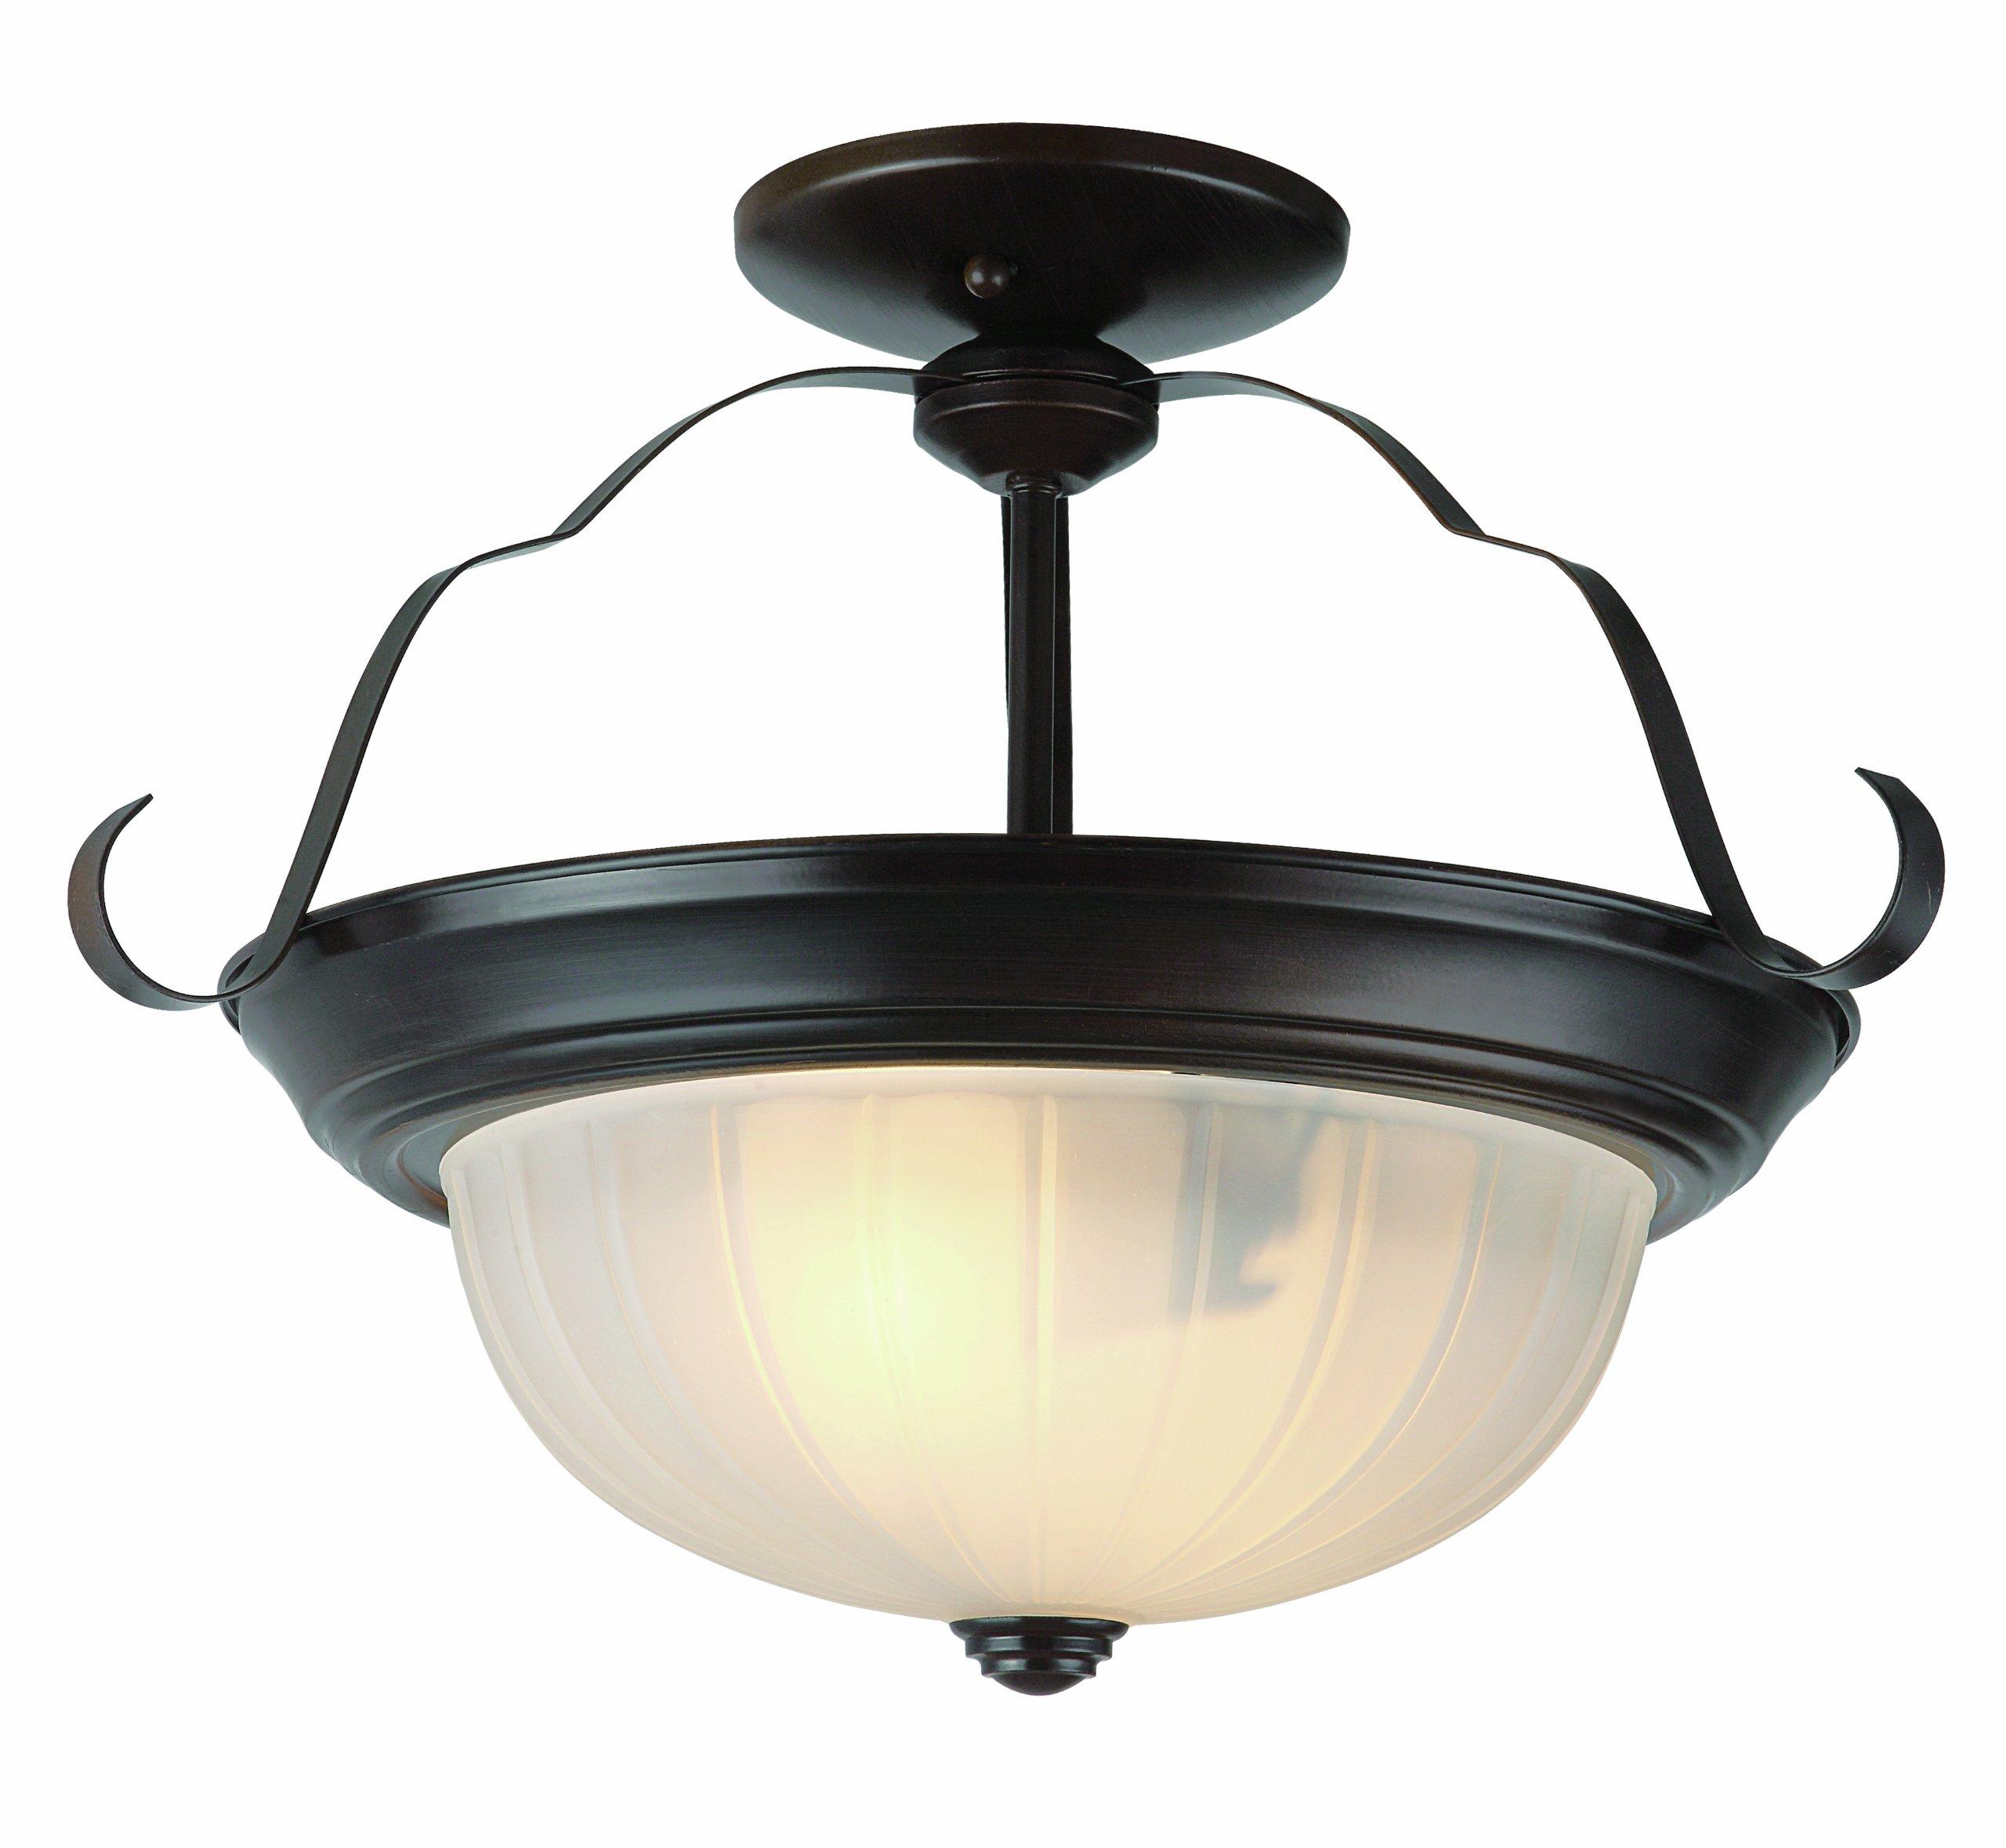 Trans Globe Lighting 13215 ROB Indoor Breakwater 15'' Semiflush, Rubbed Oil Bronze